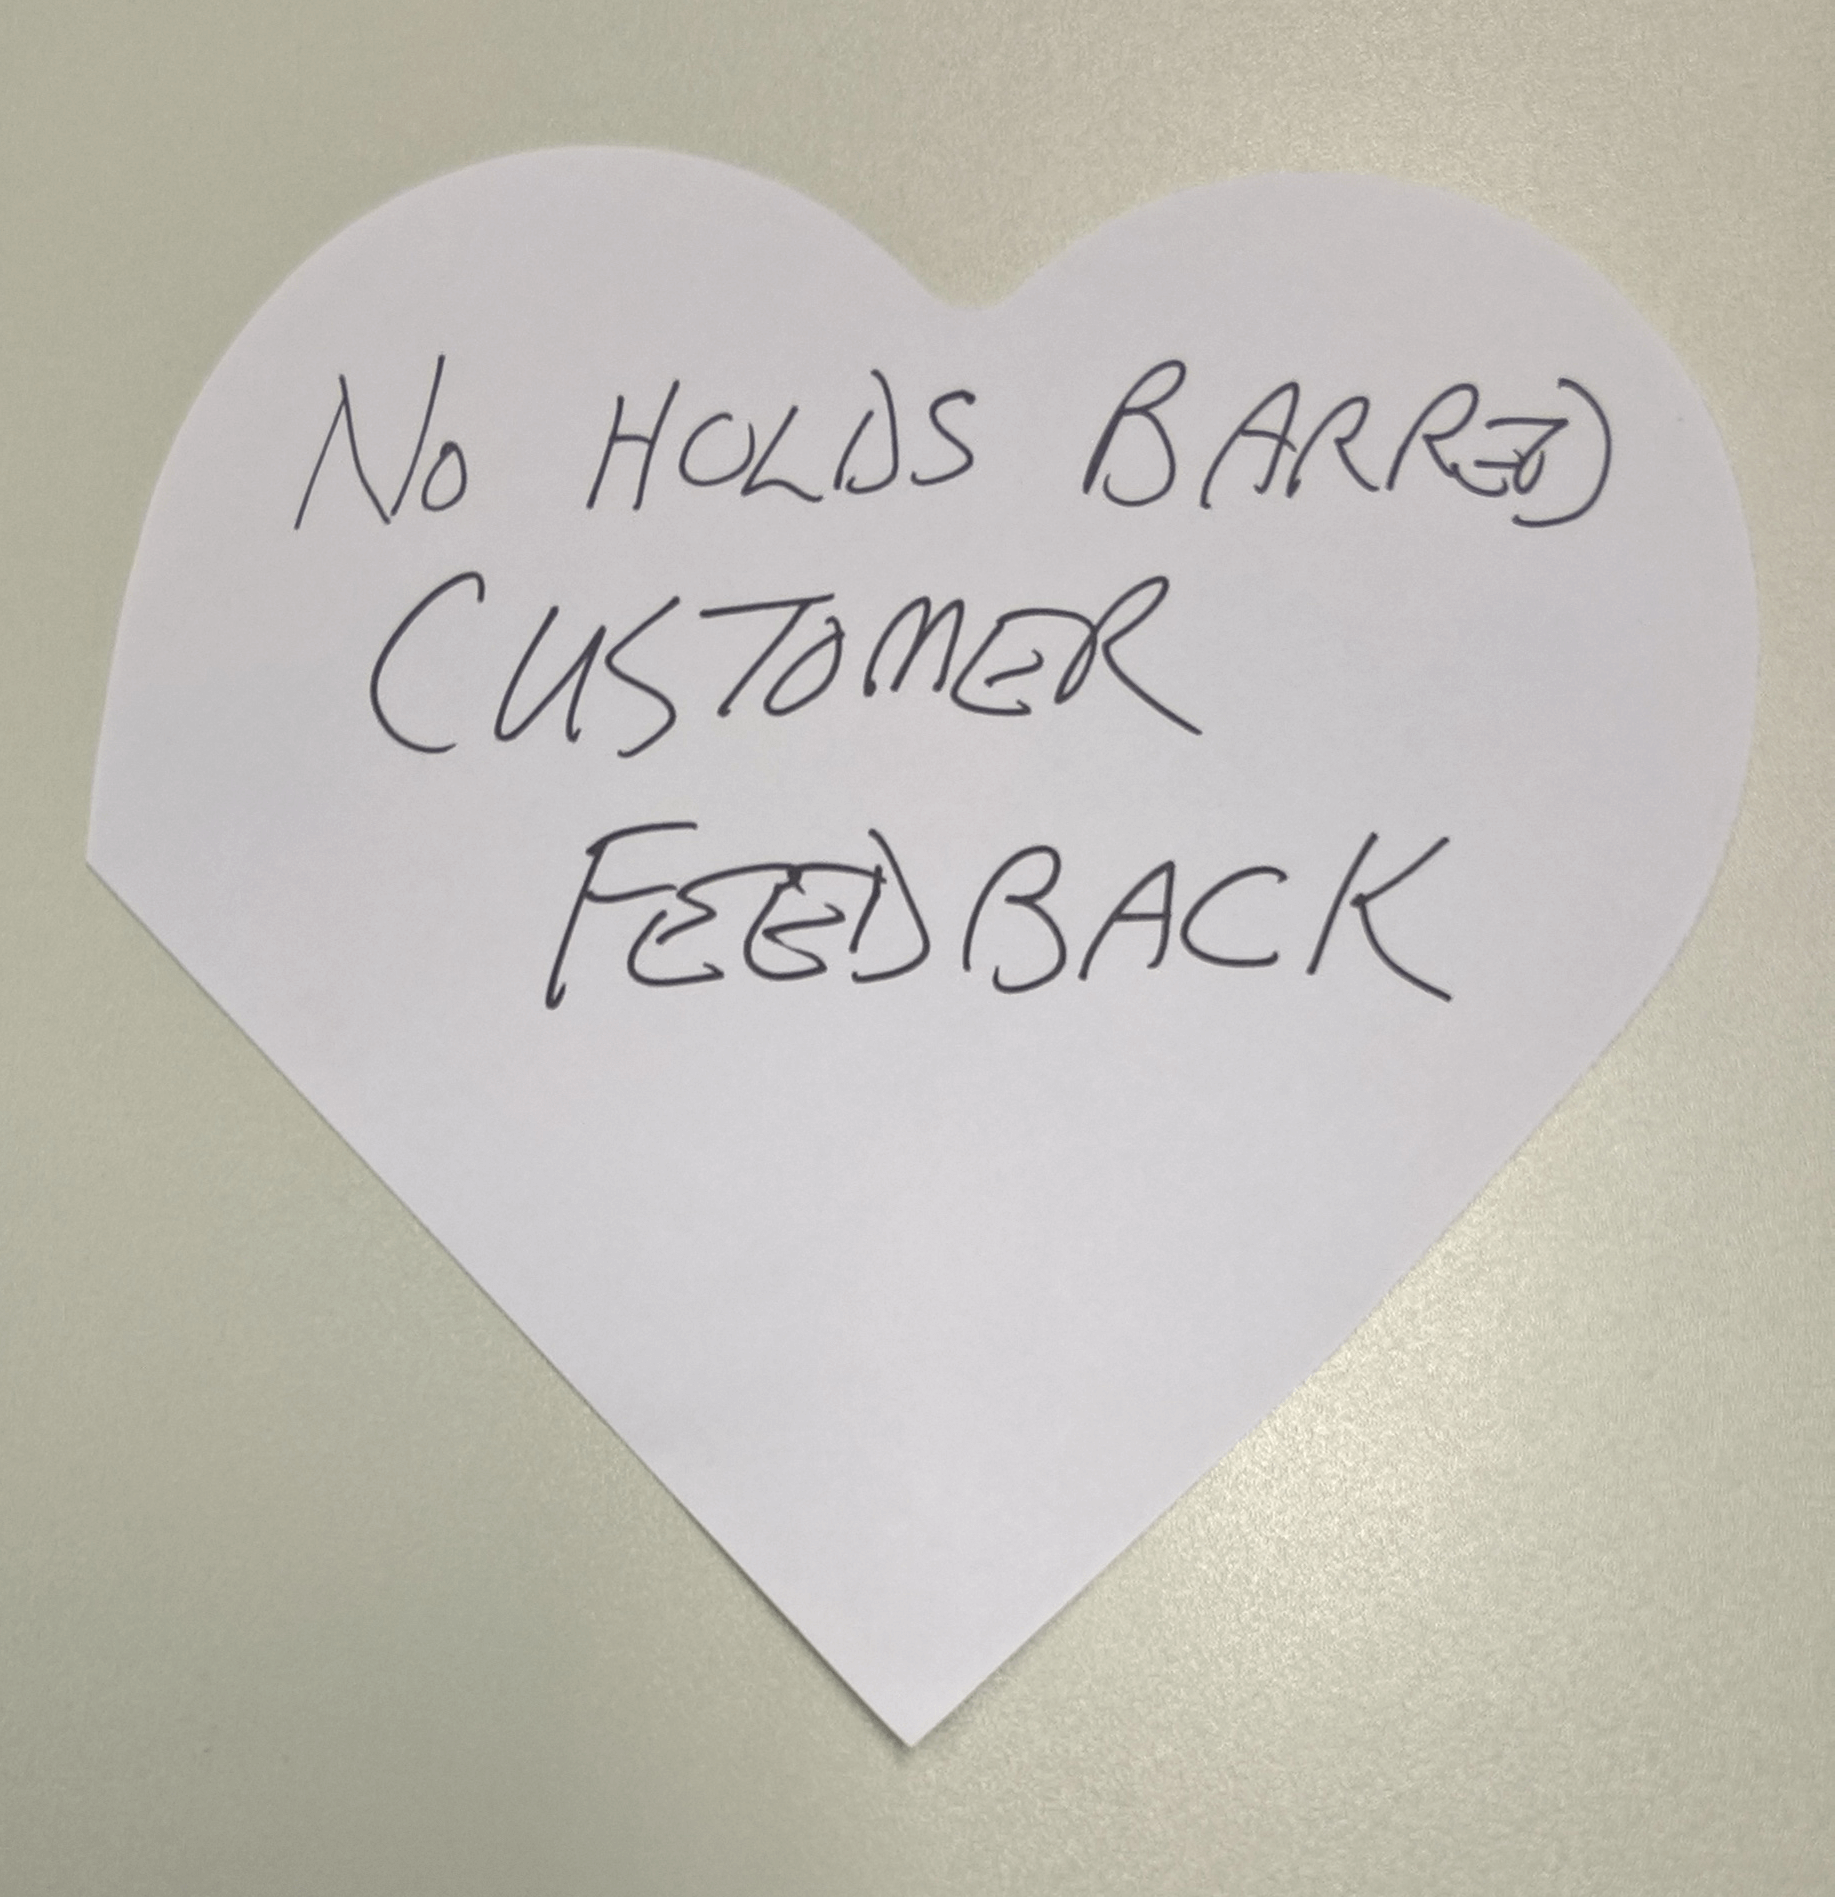 """No holds barred customer feedback."""